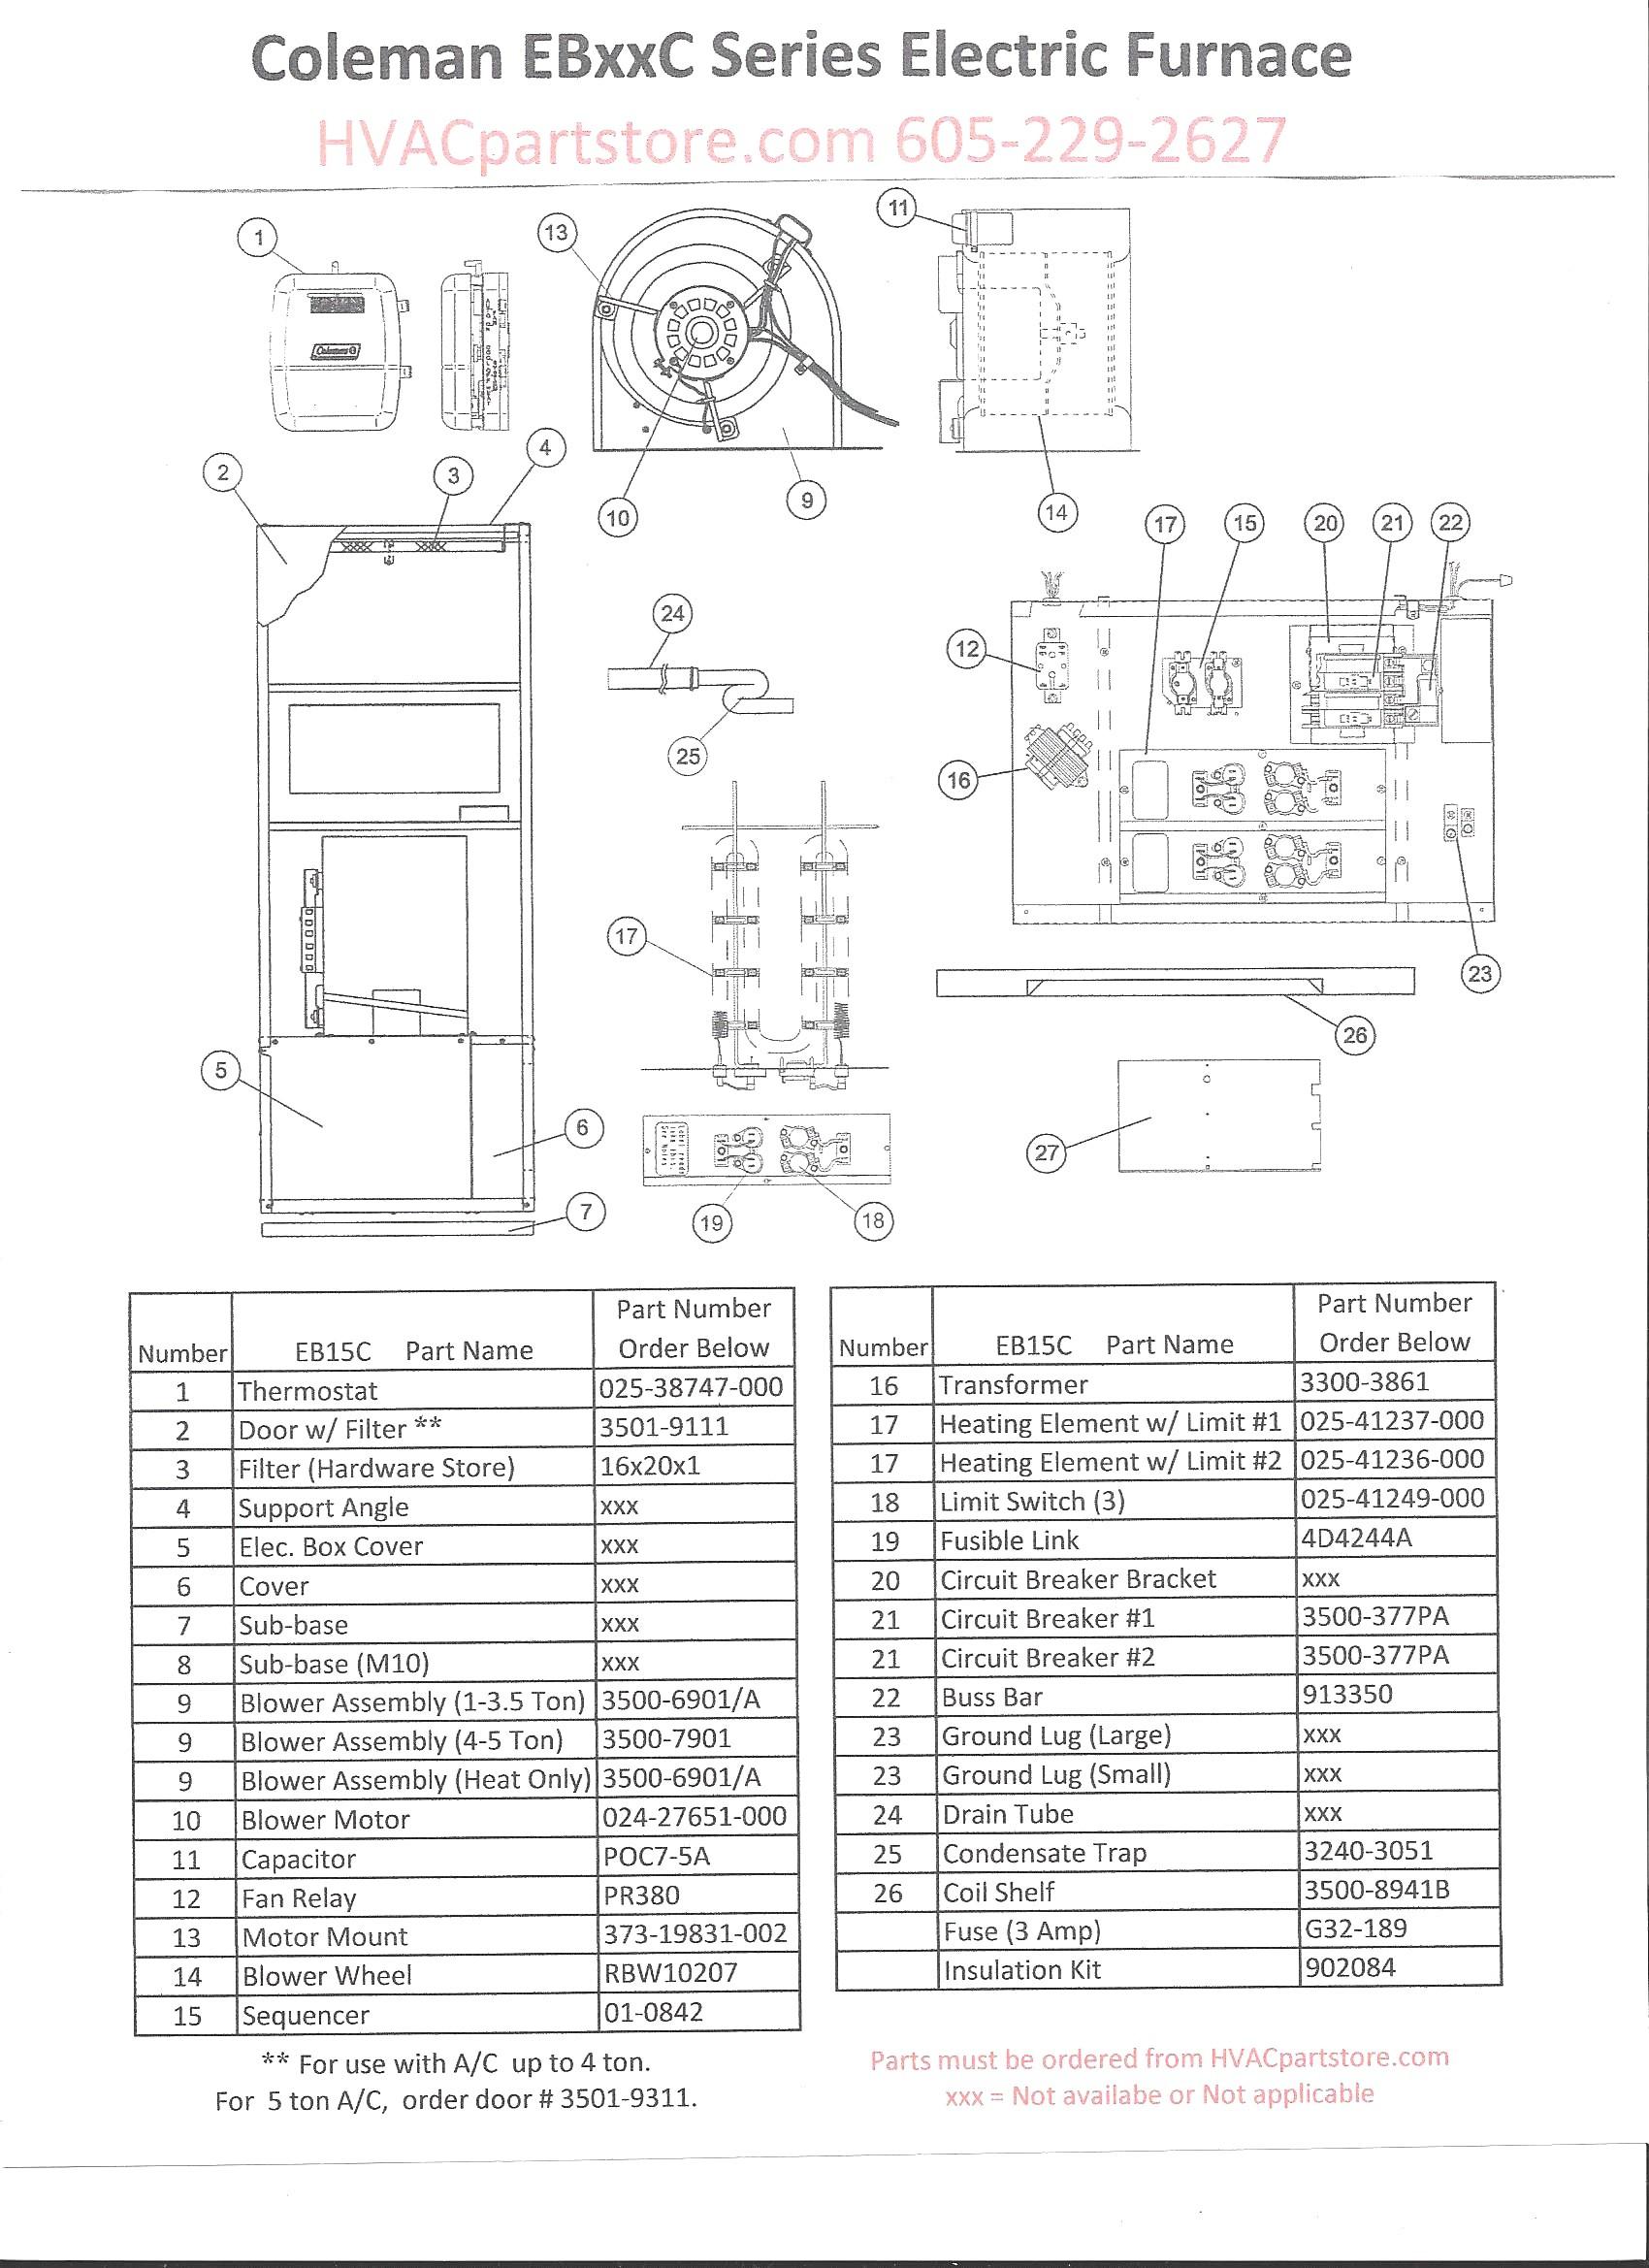 Intertherm Electric Furnace Wiring Diagram